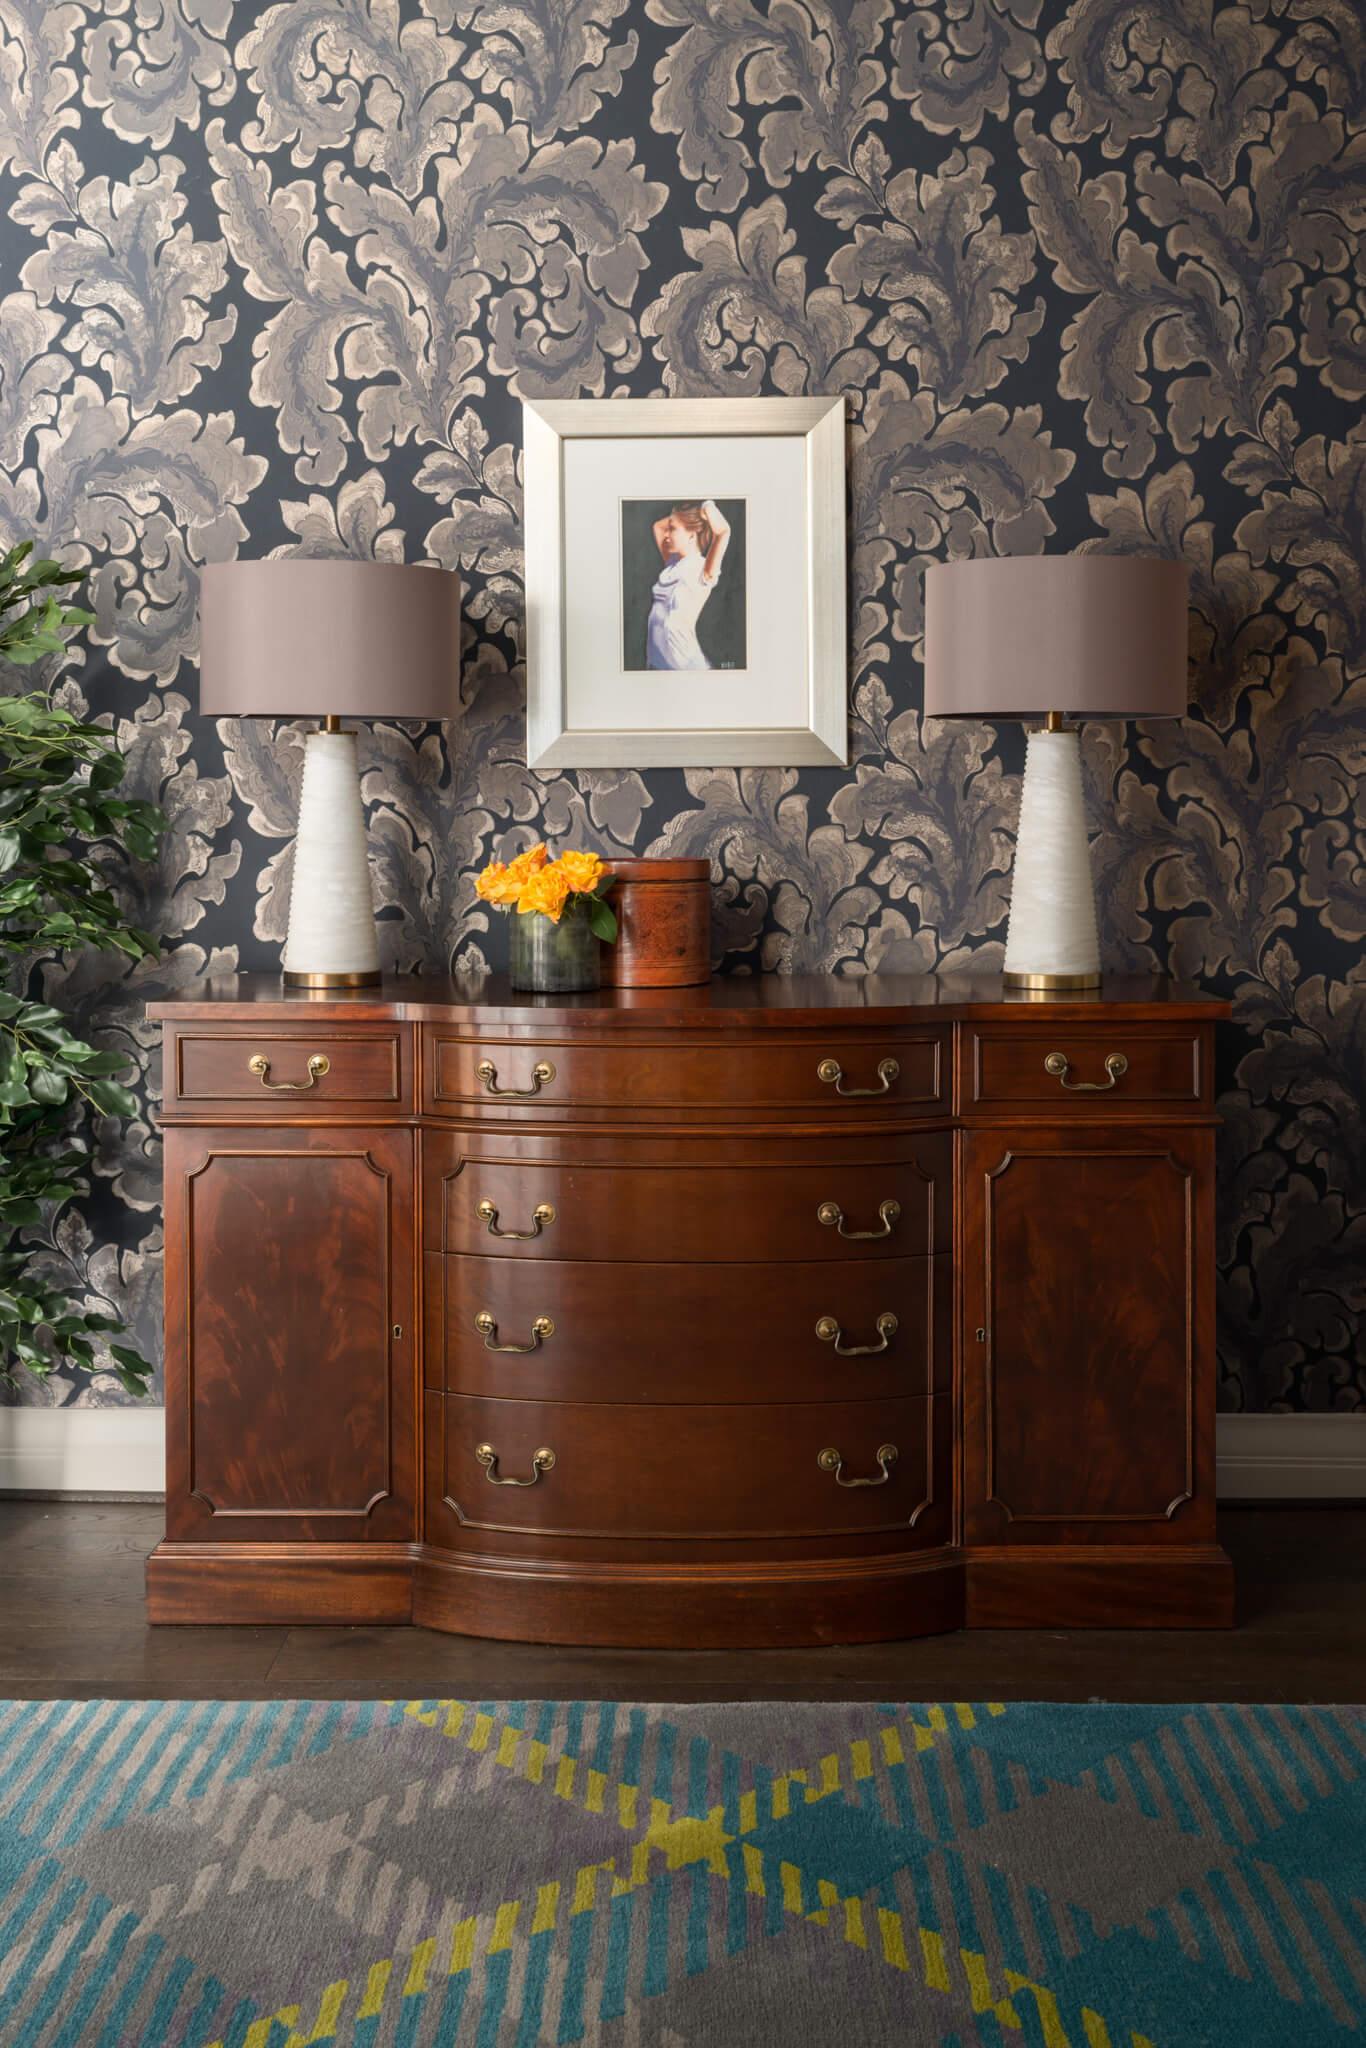 Print-Hall-Cabinet-Chelsea-Mclaine-Interiors-Introductory-Shoot-©ZACandZAC